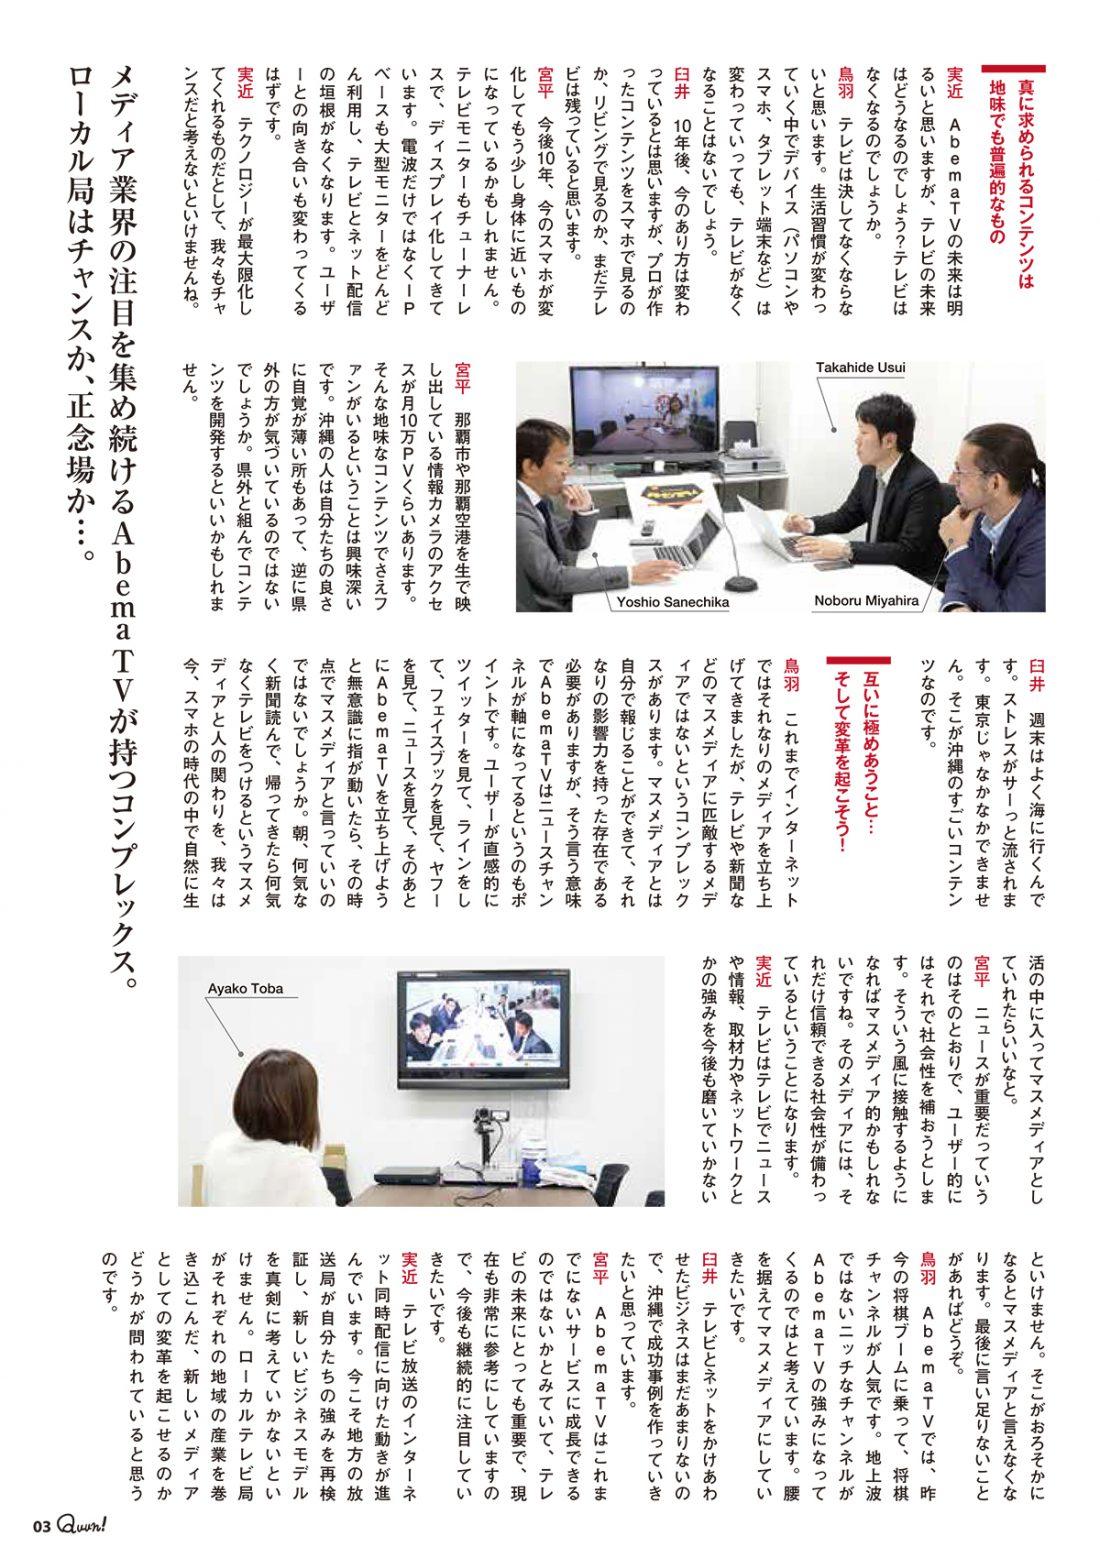 https://www.qab.co.jp/qgoro/wp-content/uploads/quun_0805-1100x1558.jpg